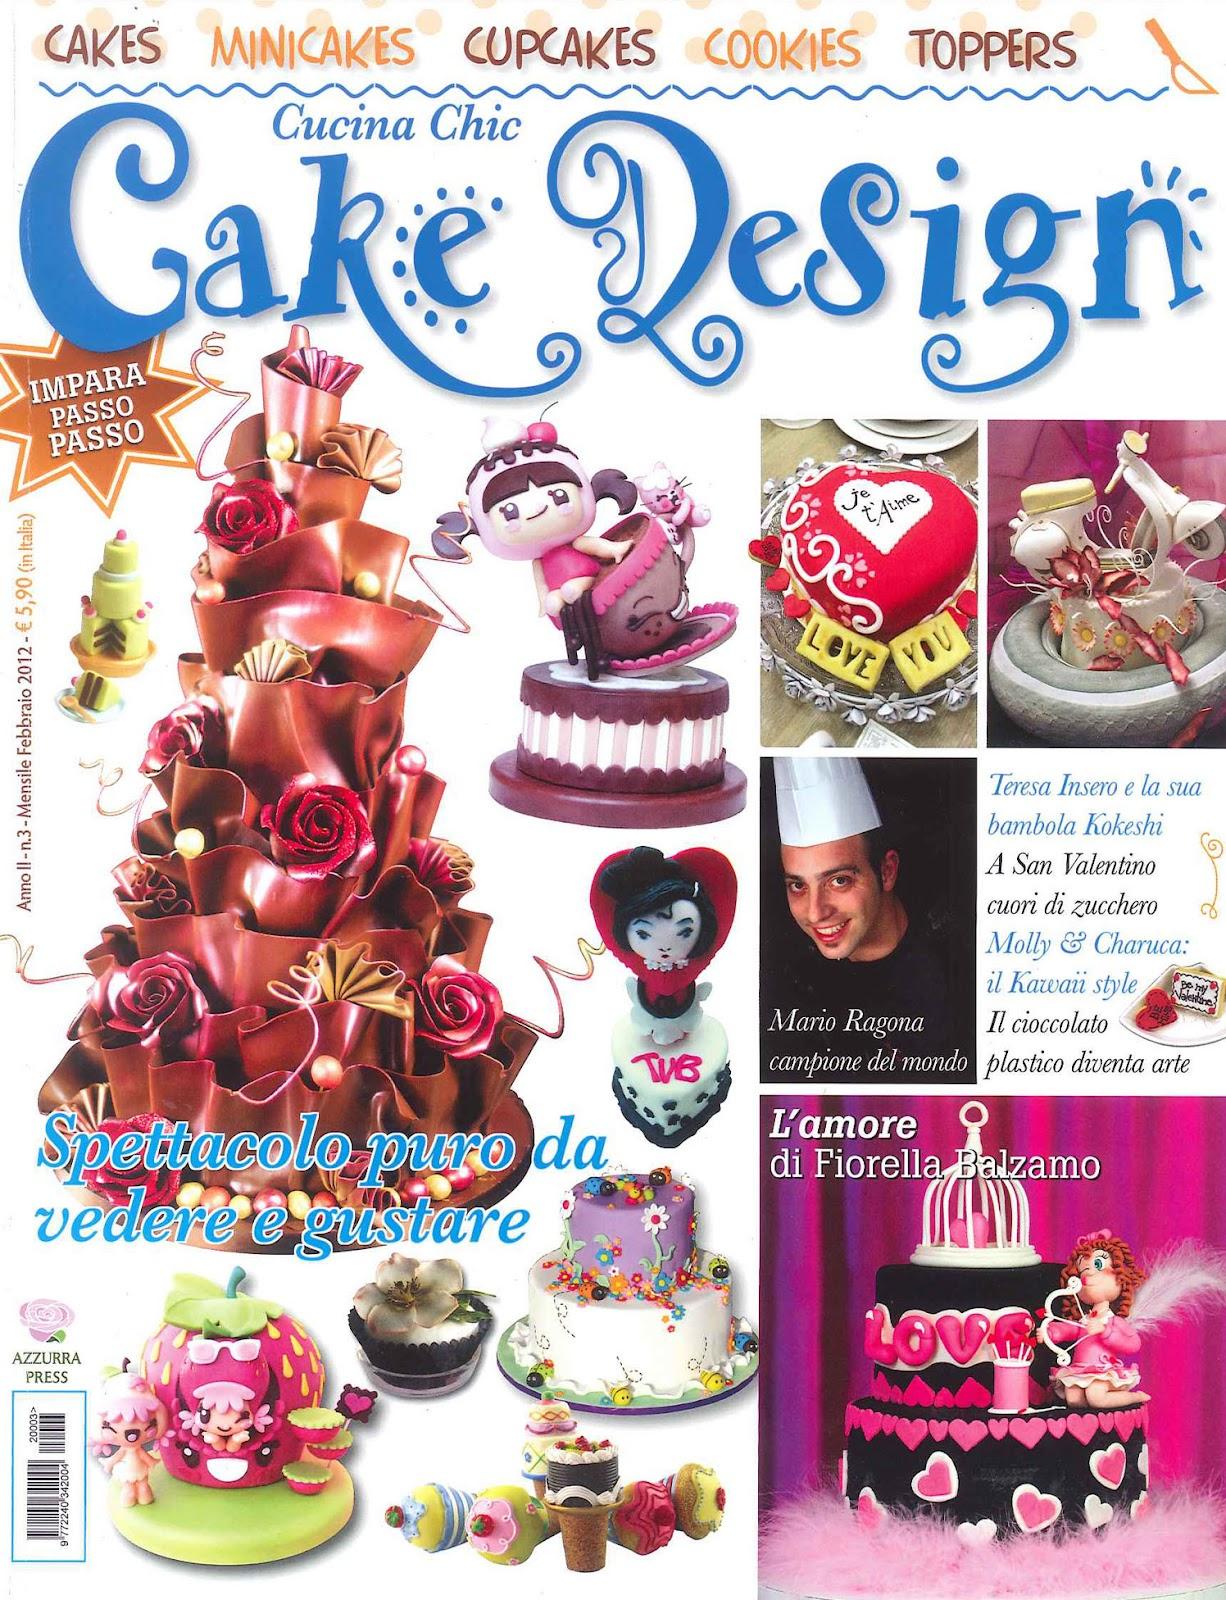 Emejing Cucina Chic Cake Design Images - ferrorods.us - ferrorods.us